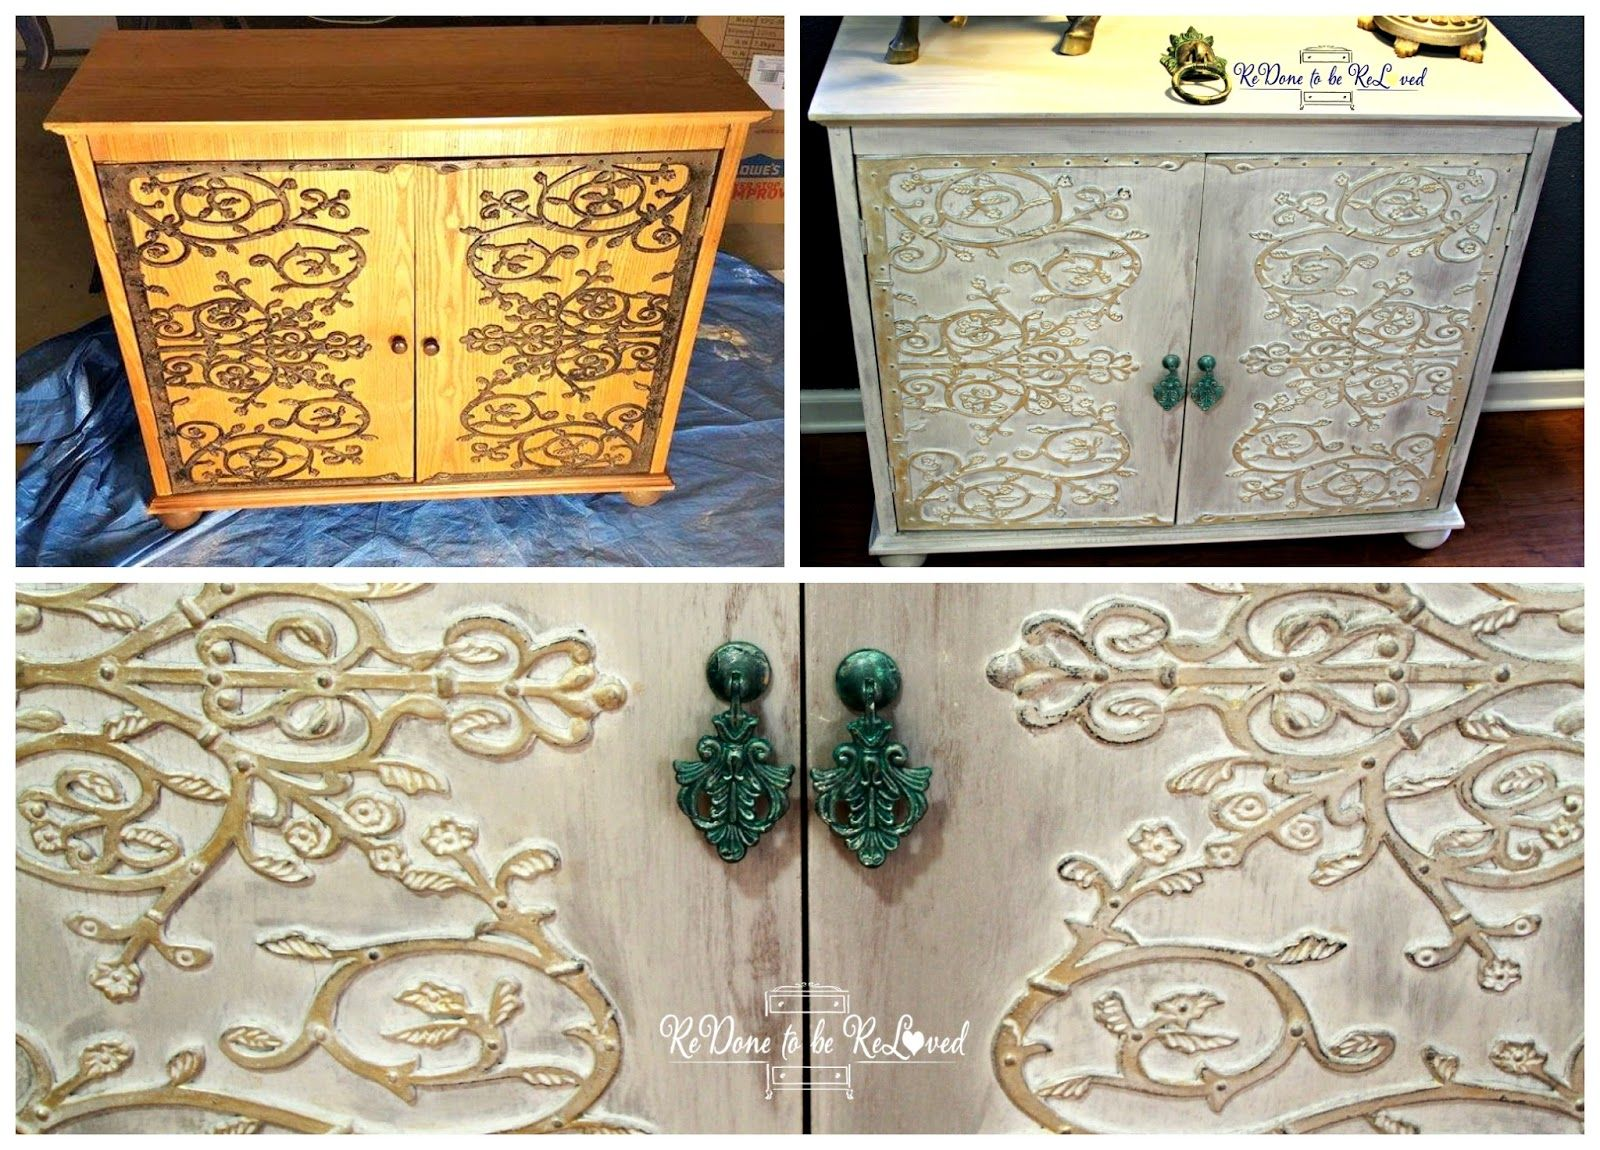 watch white to garden rattan stores repair restoration supplies youtube furniture how